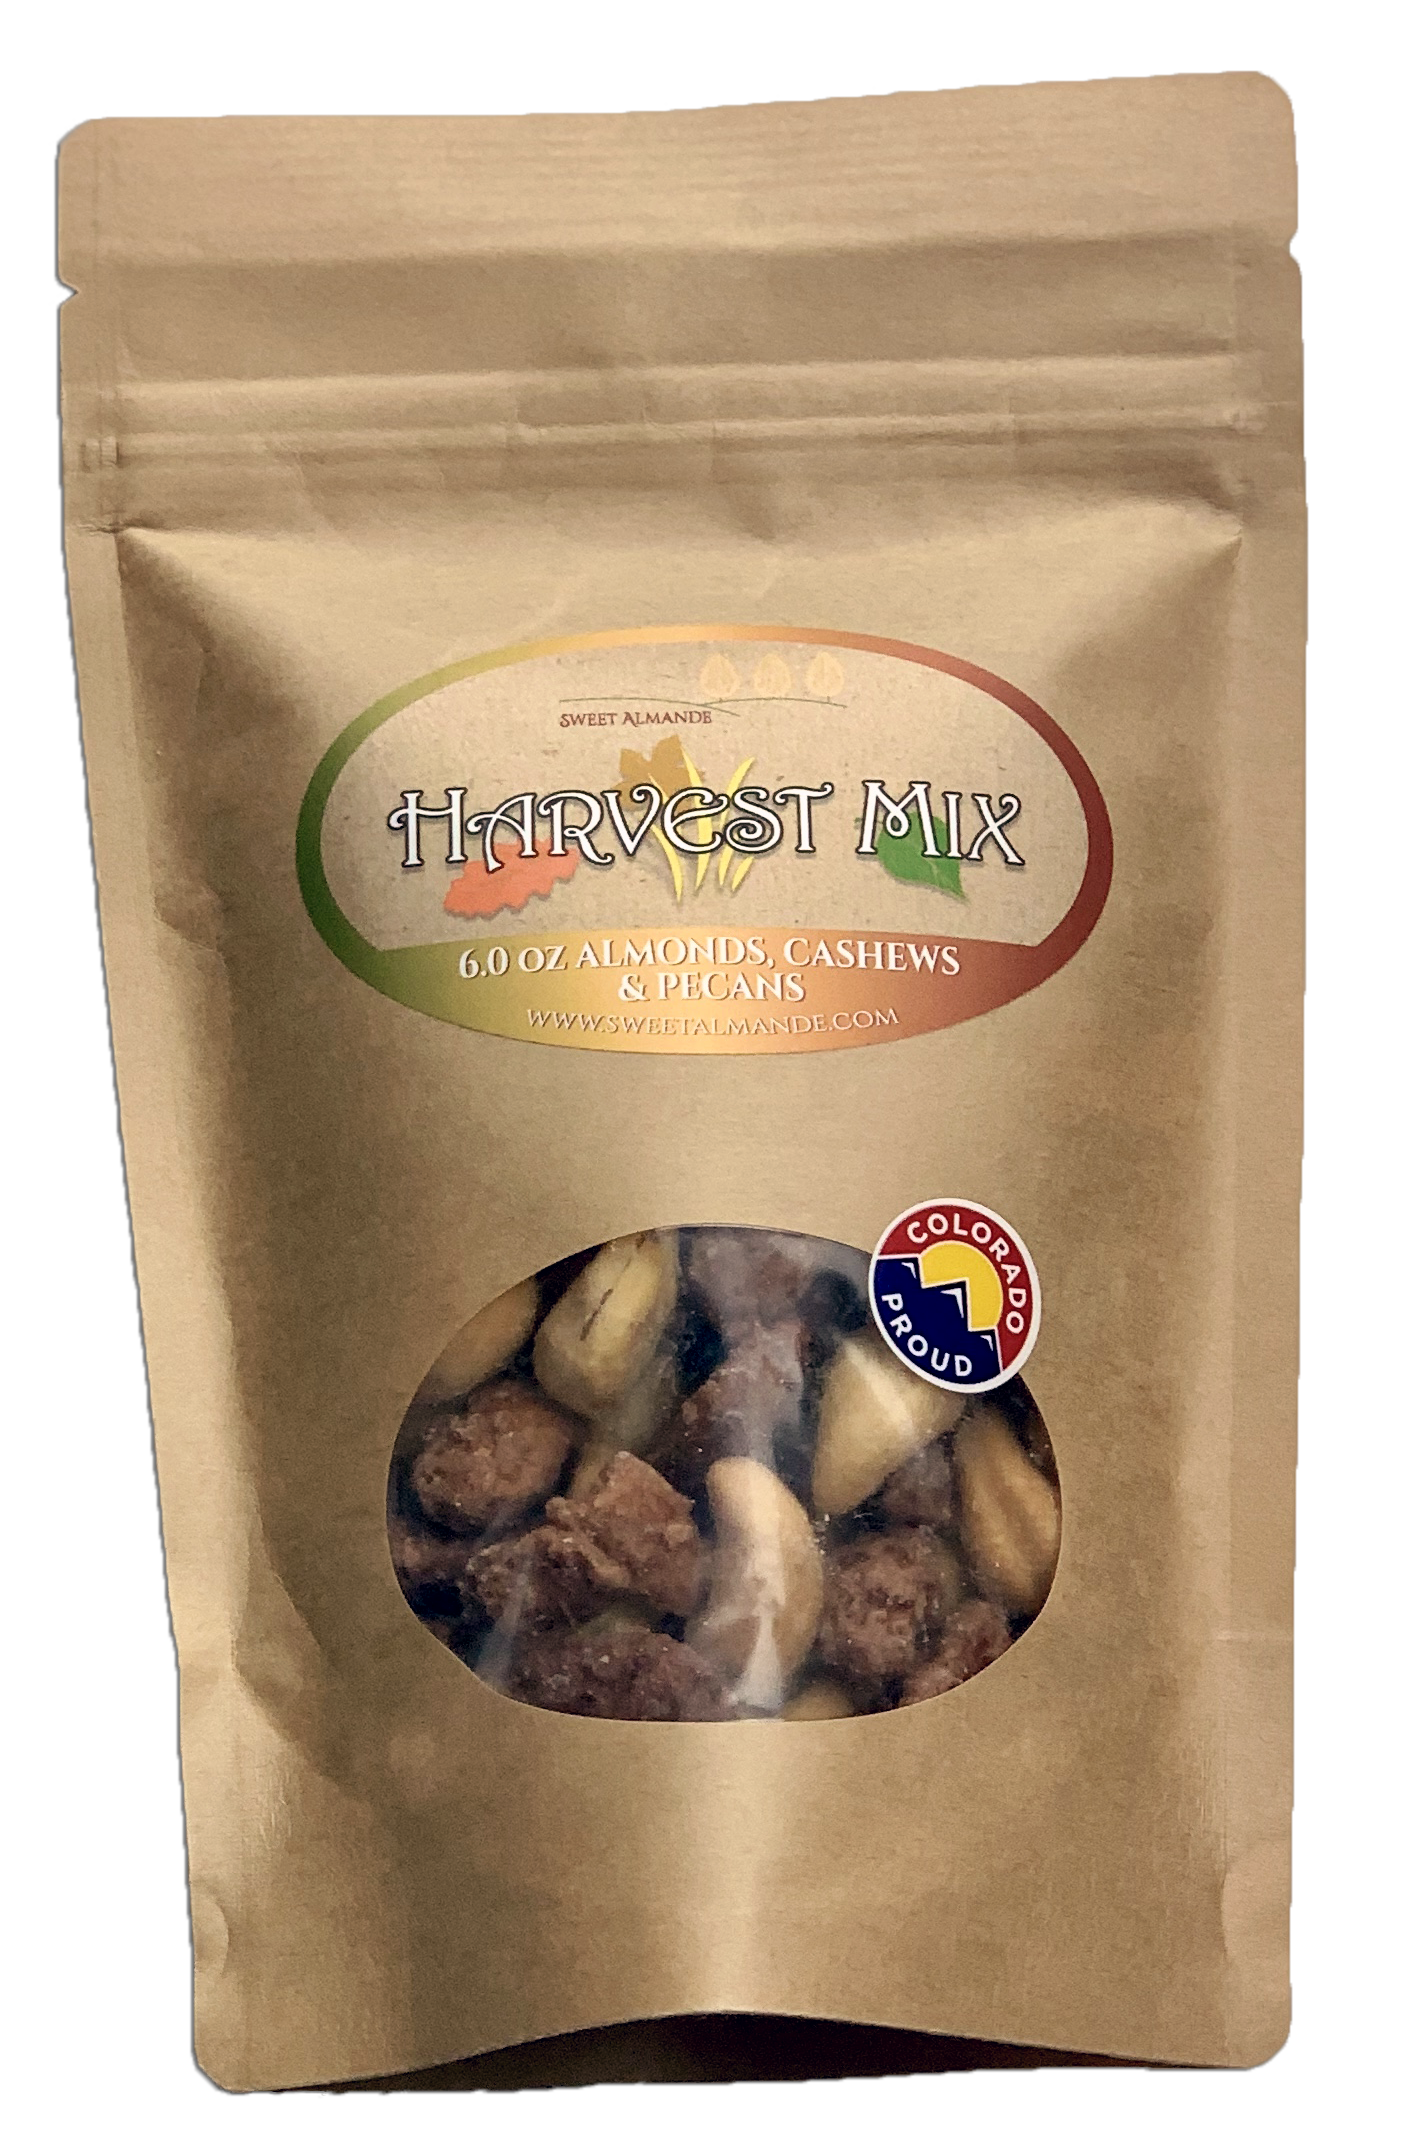 Sweet Almande Harvest Mix